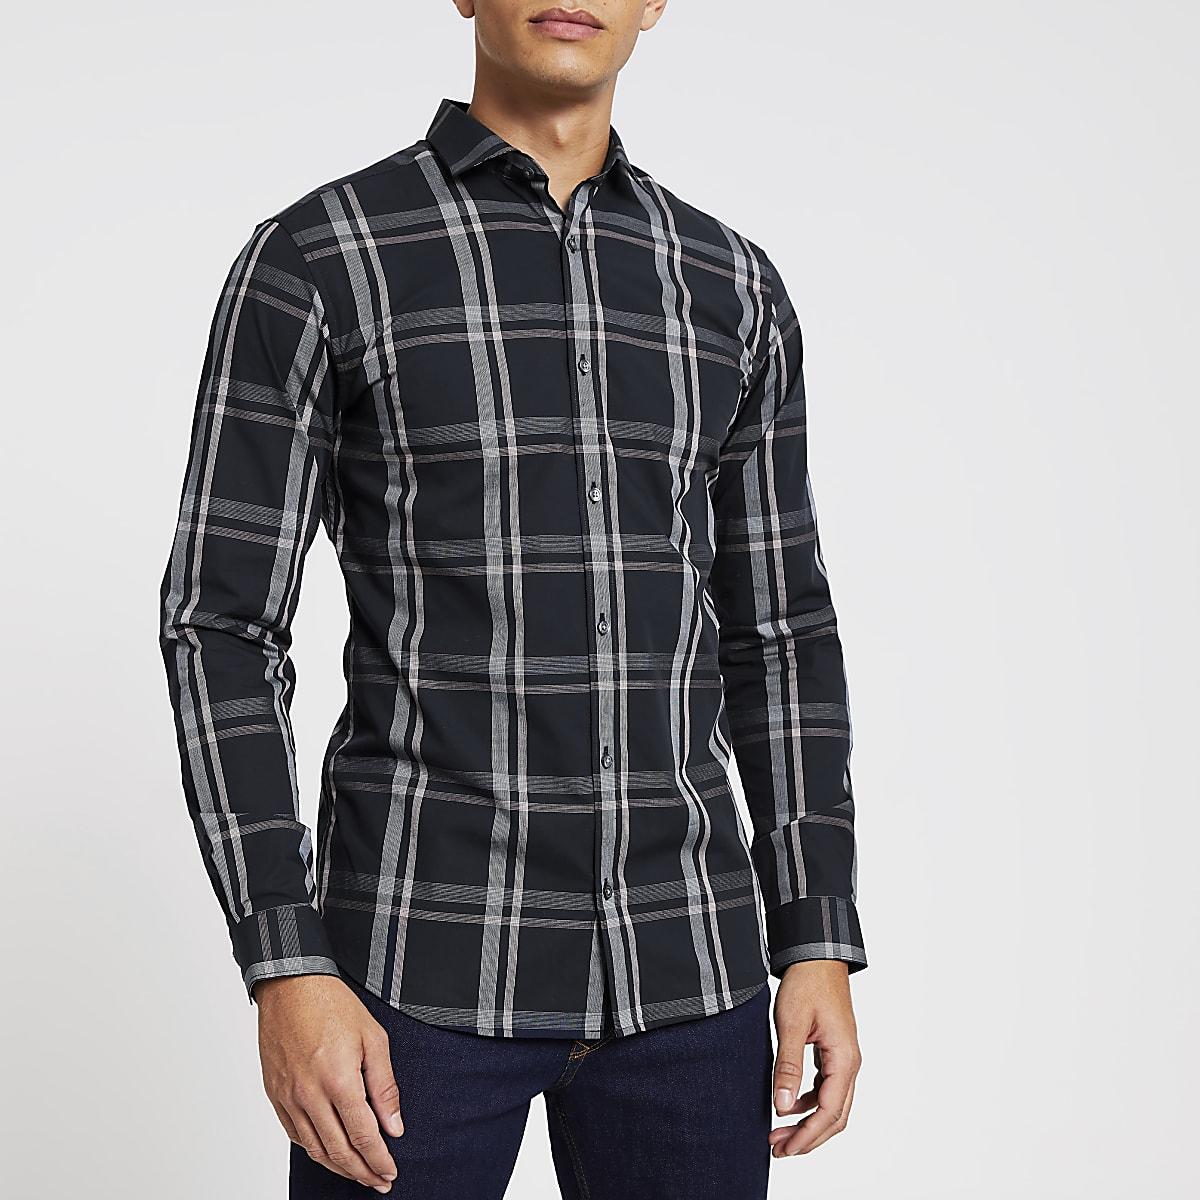 Jack and Jones navy check long sleeve shirt